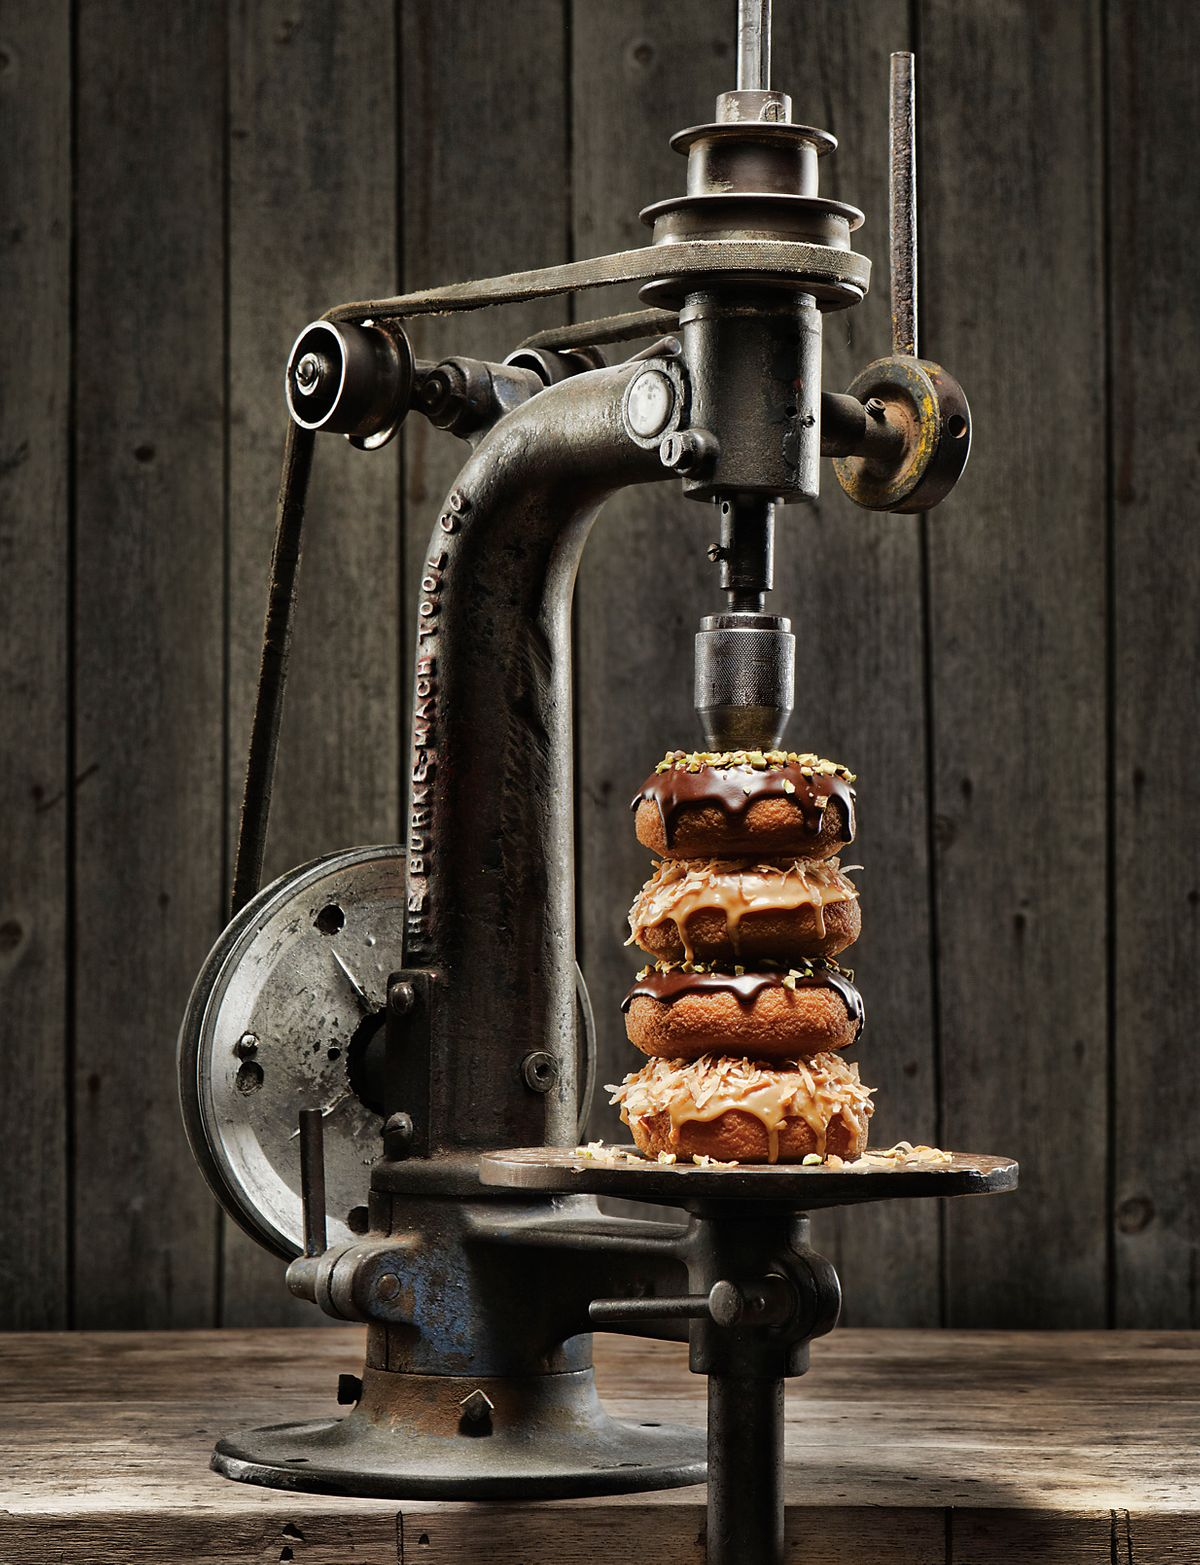 lisa bishop food stylist- drilled down donuts